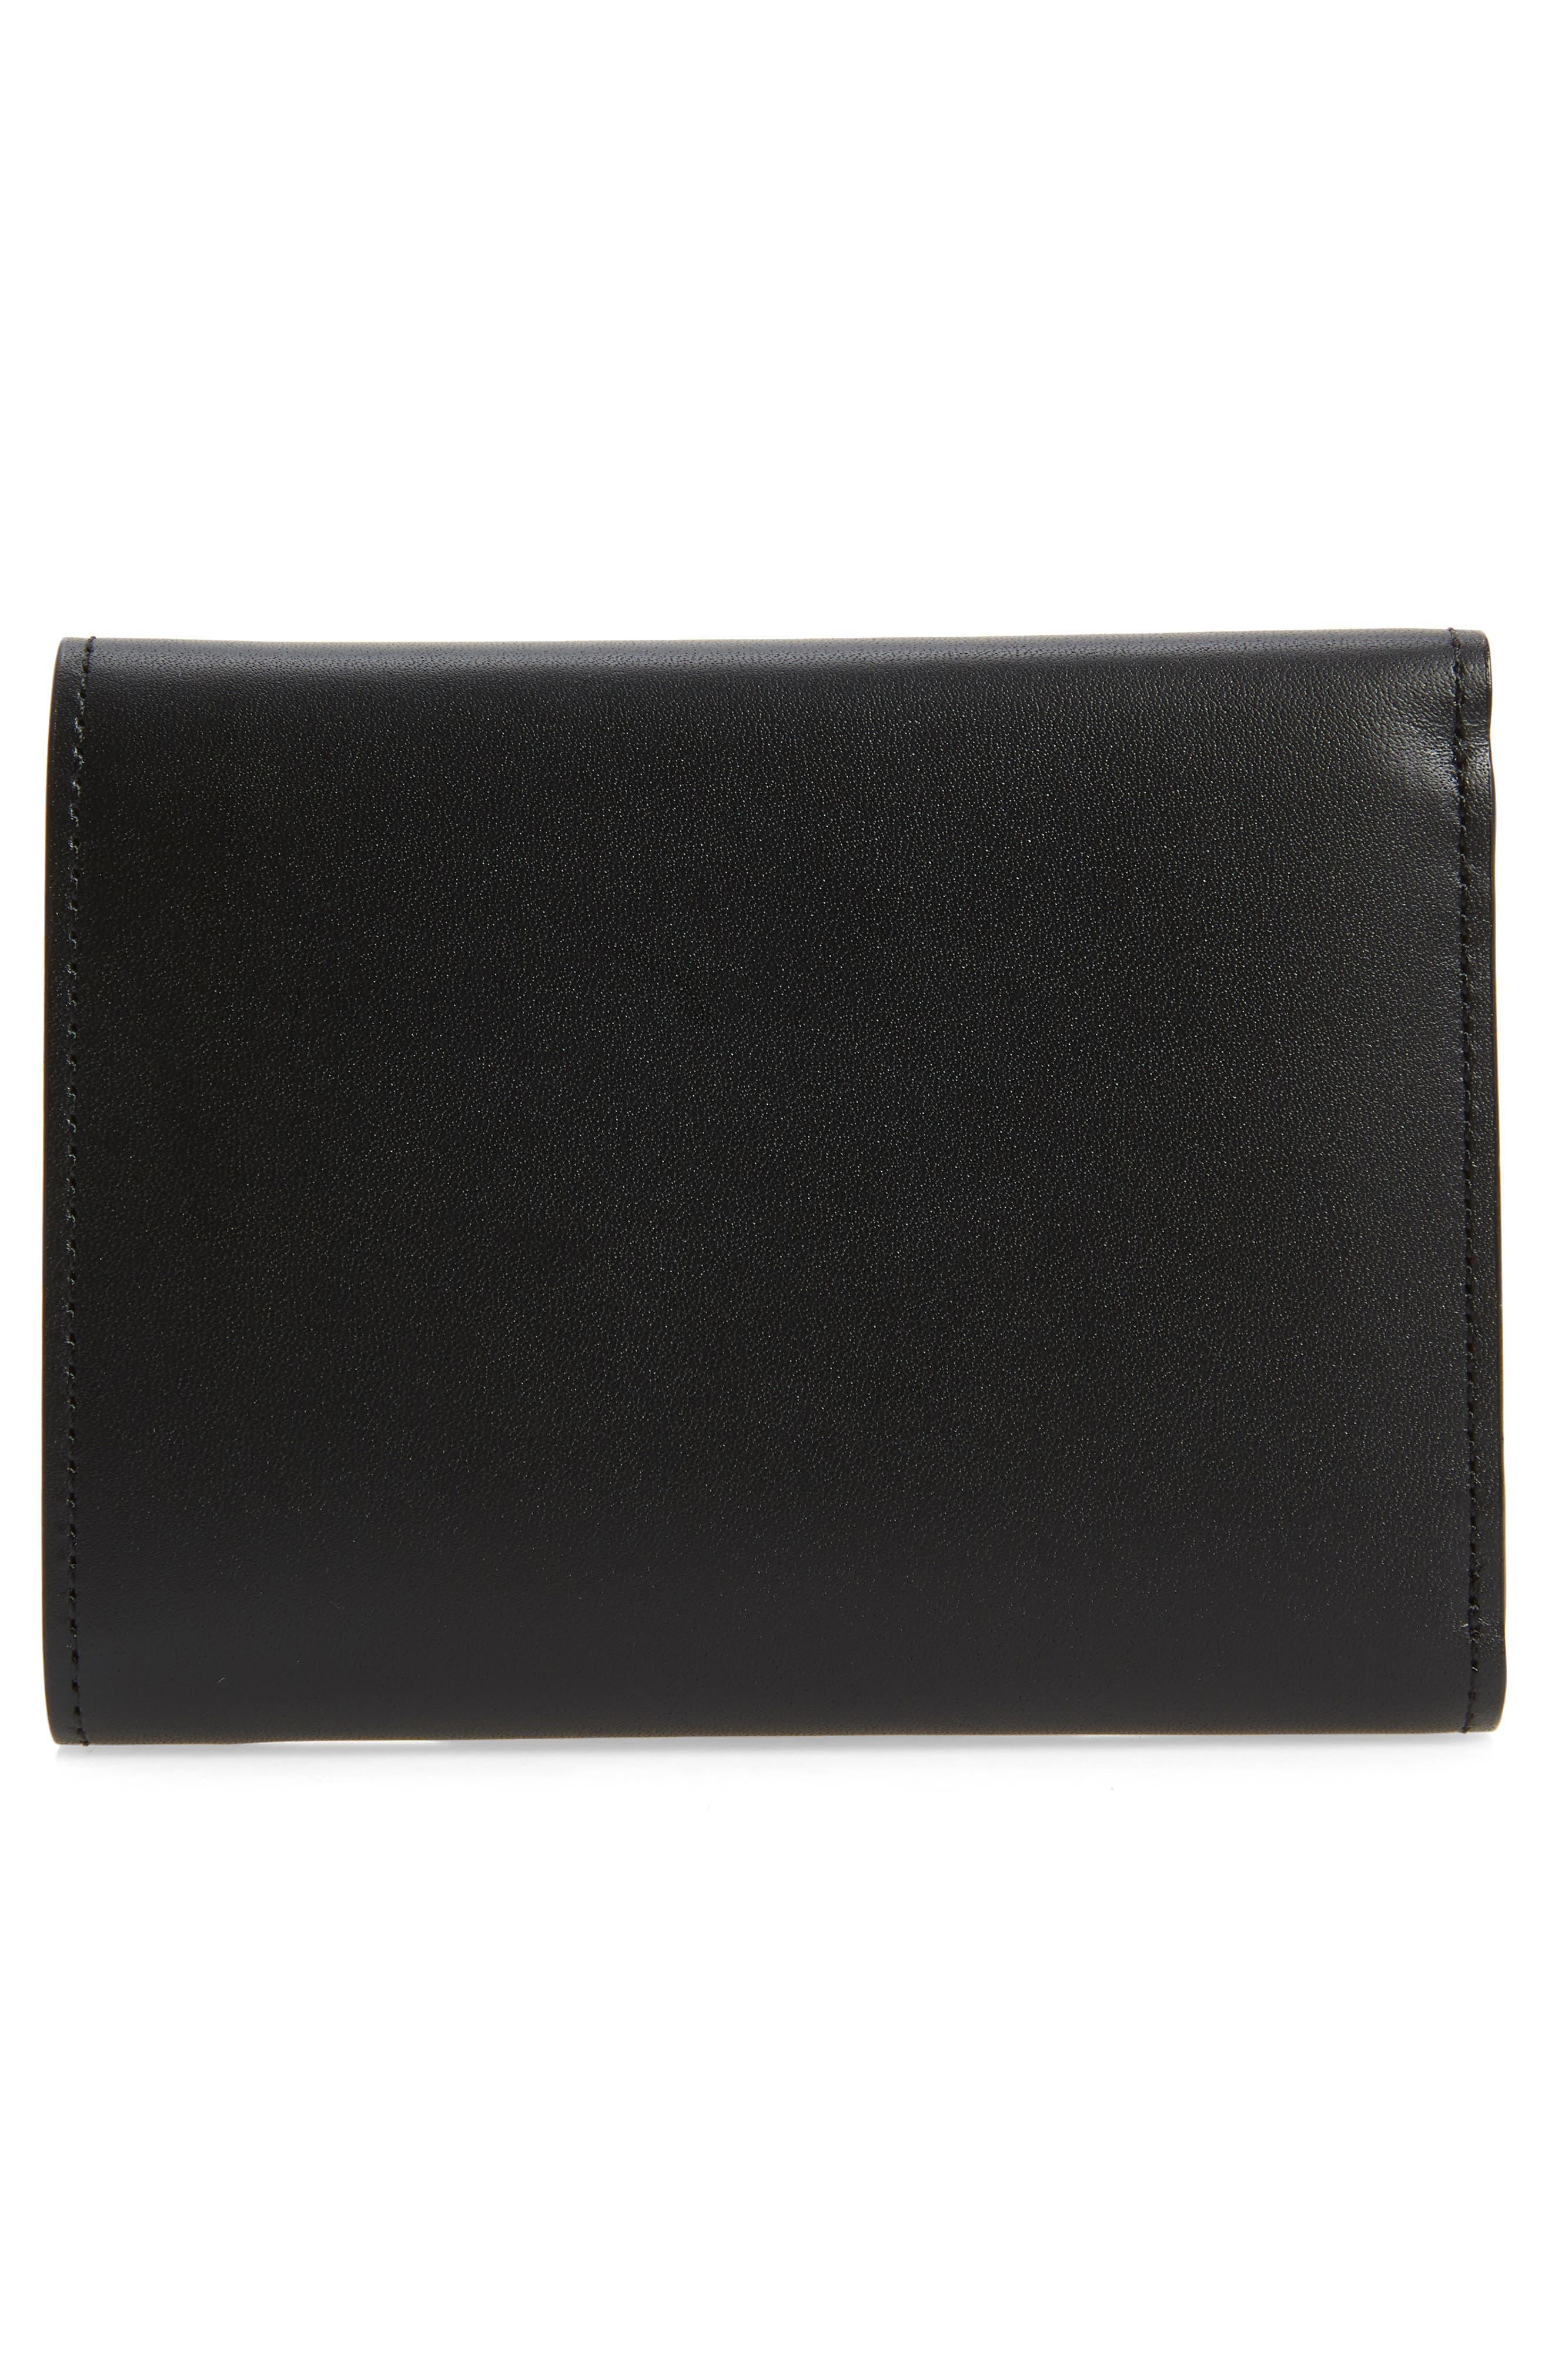 Spacemen Leather Wallet,                             Alternate thumbnail 3, color,                             Black